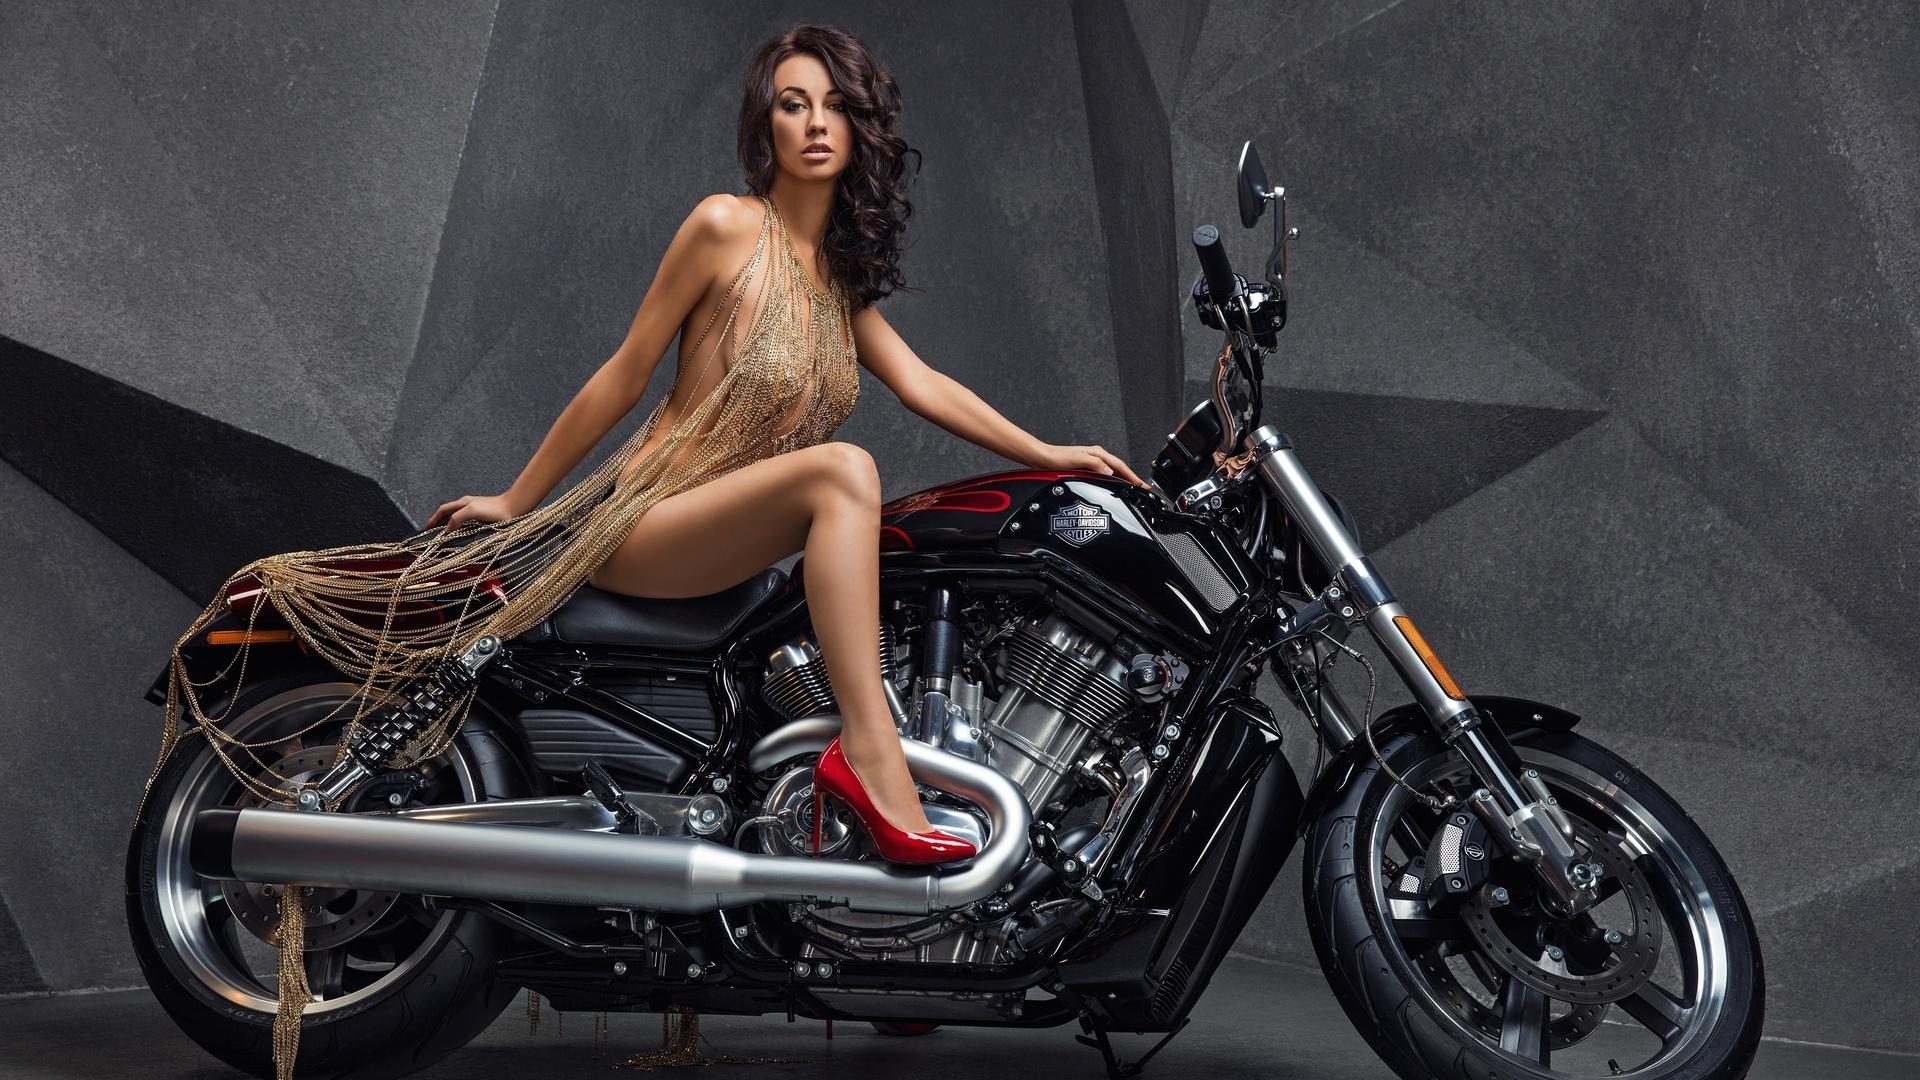 Harley davidson swimsuit model — pic 8